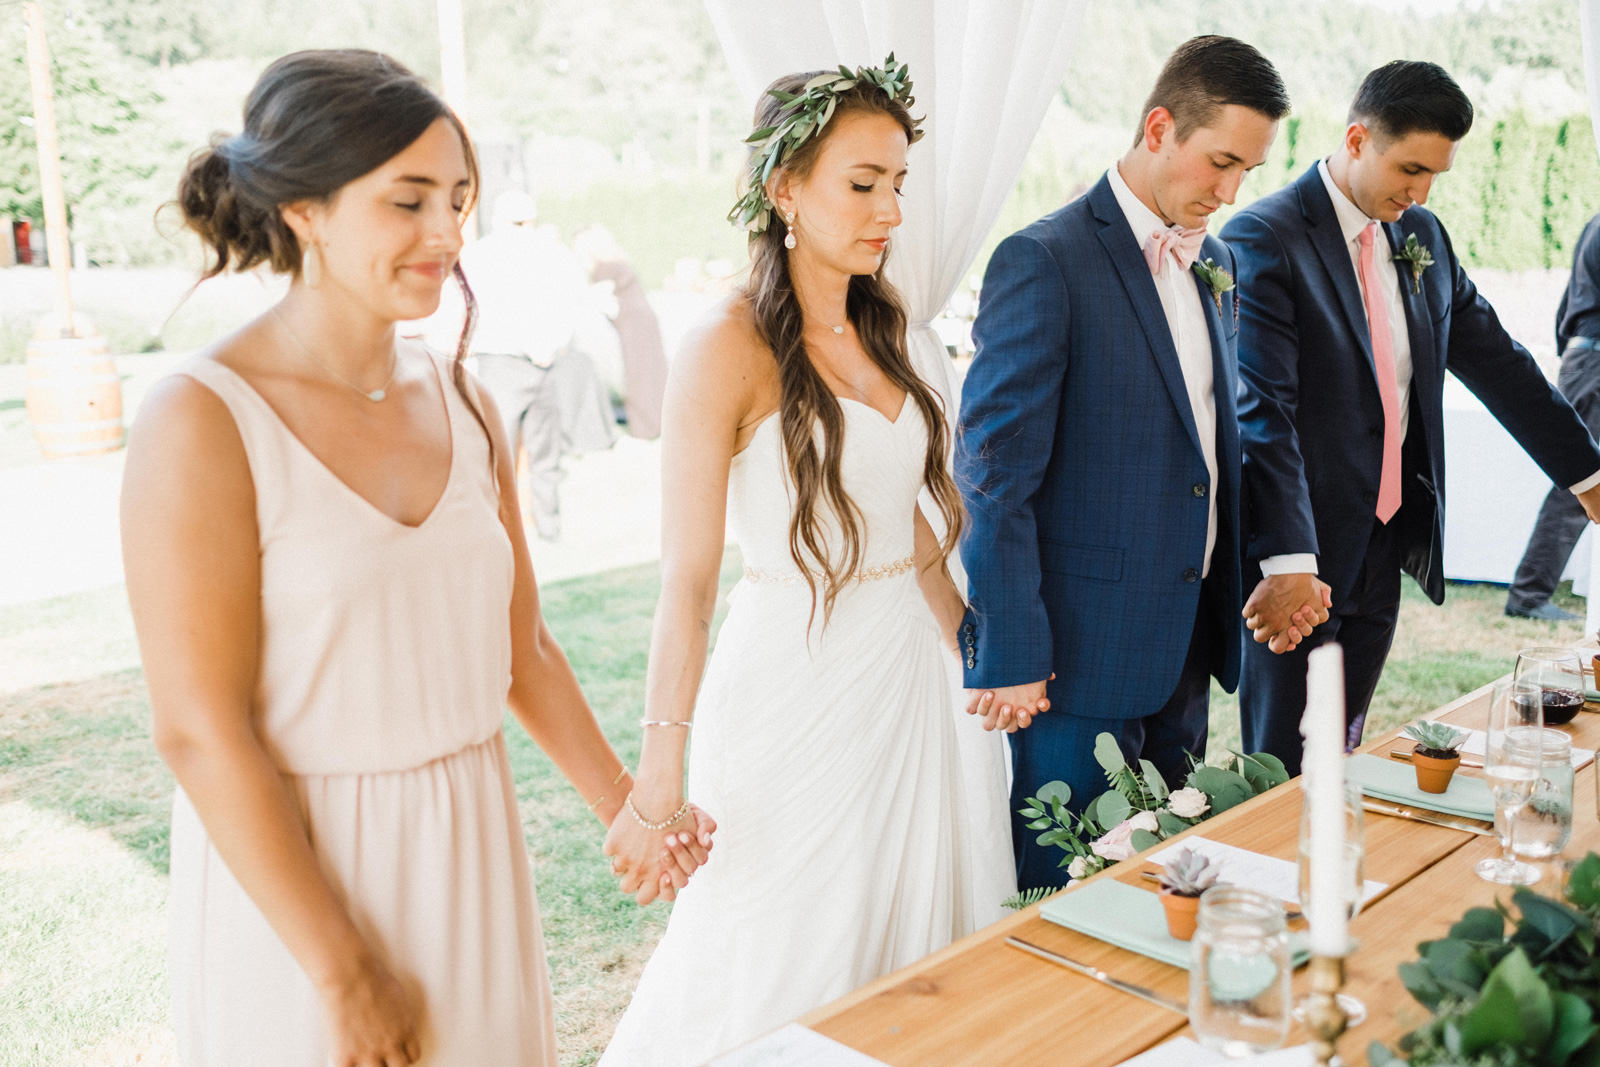 059-woodinville-lavendar-farm-wedding-with-golden-glowy-photos.jpg